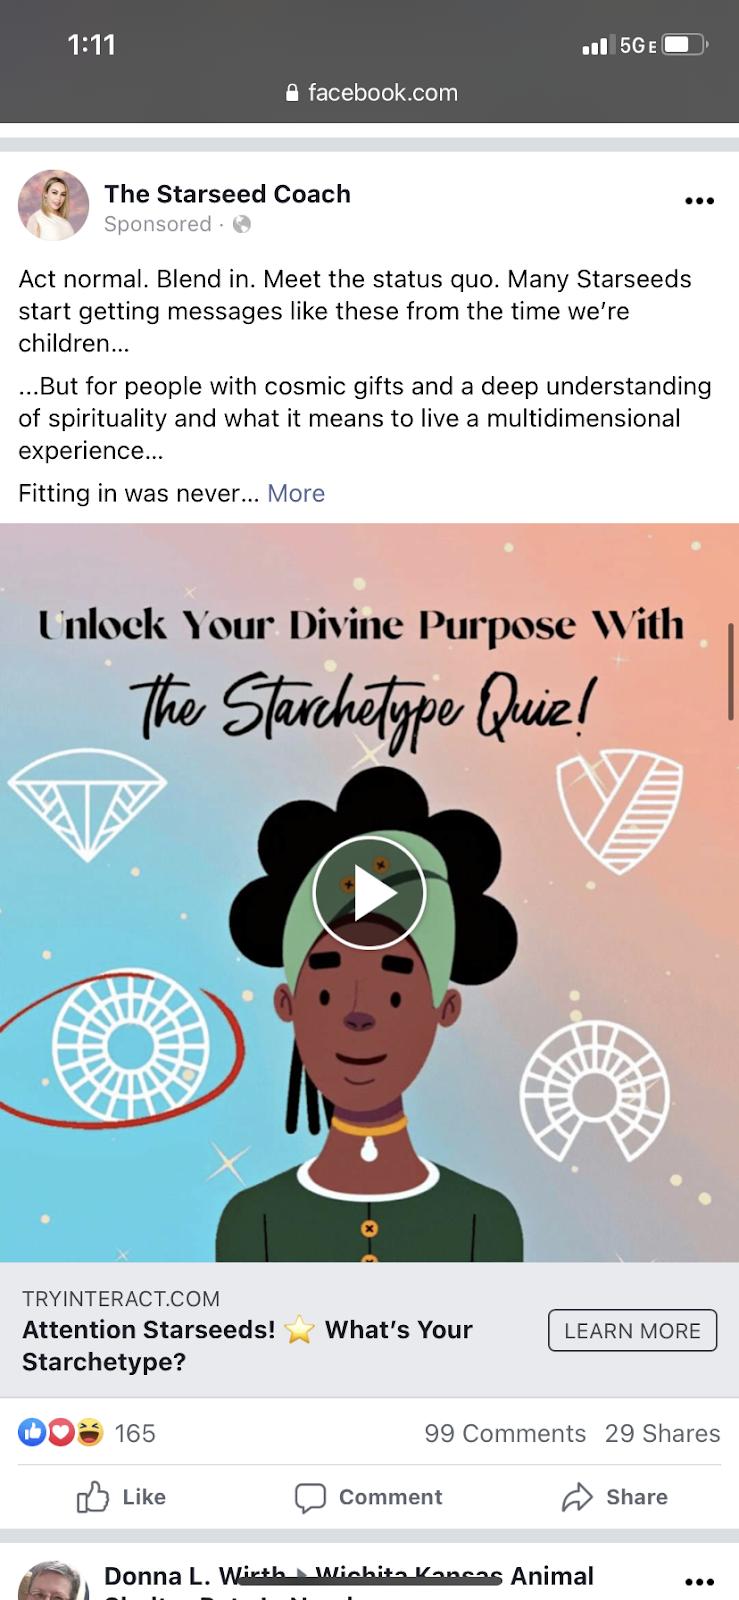 Facebook ad of quiz